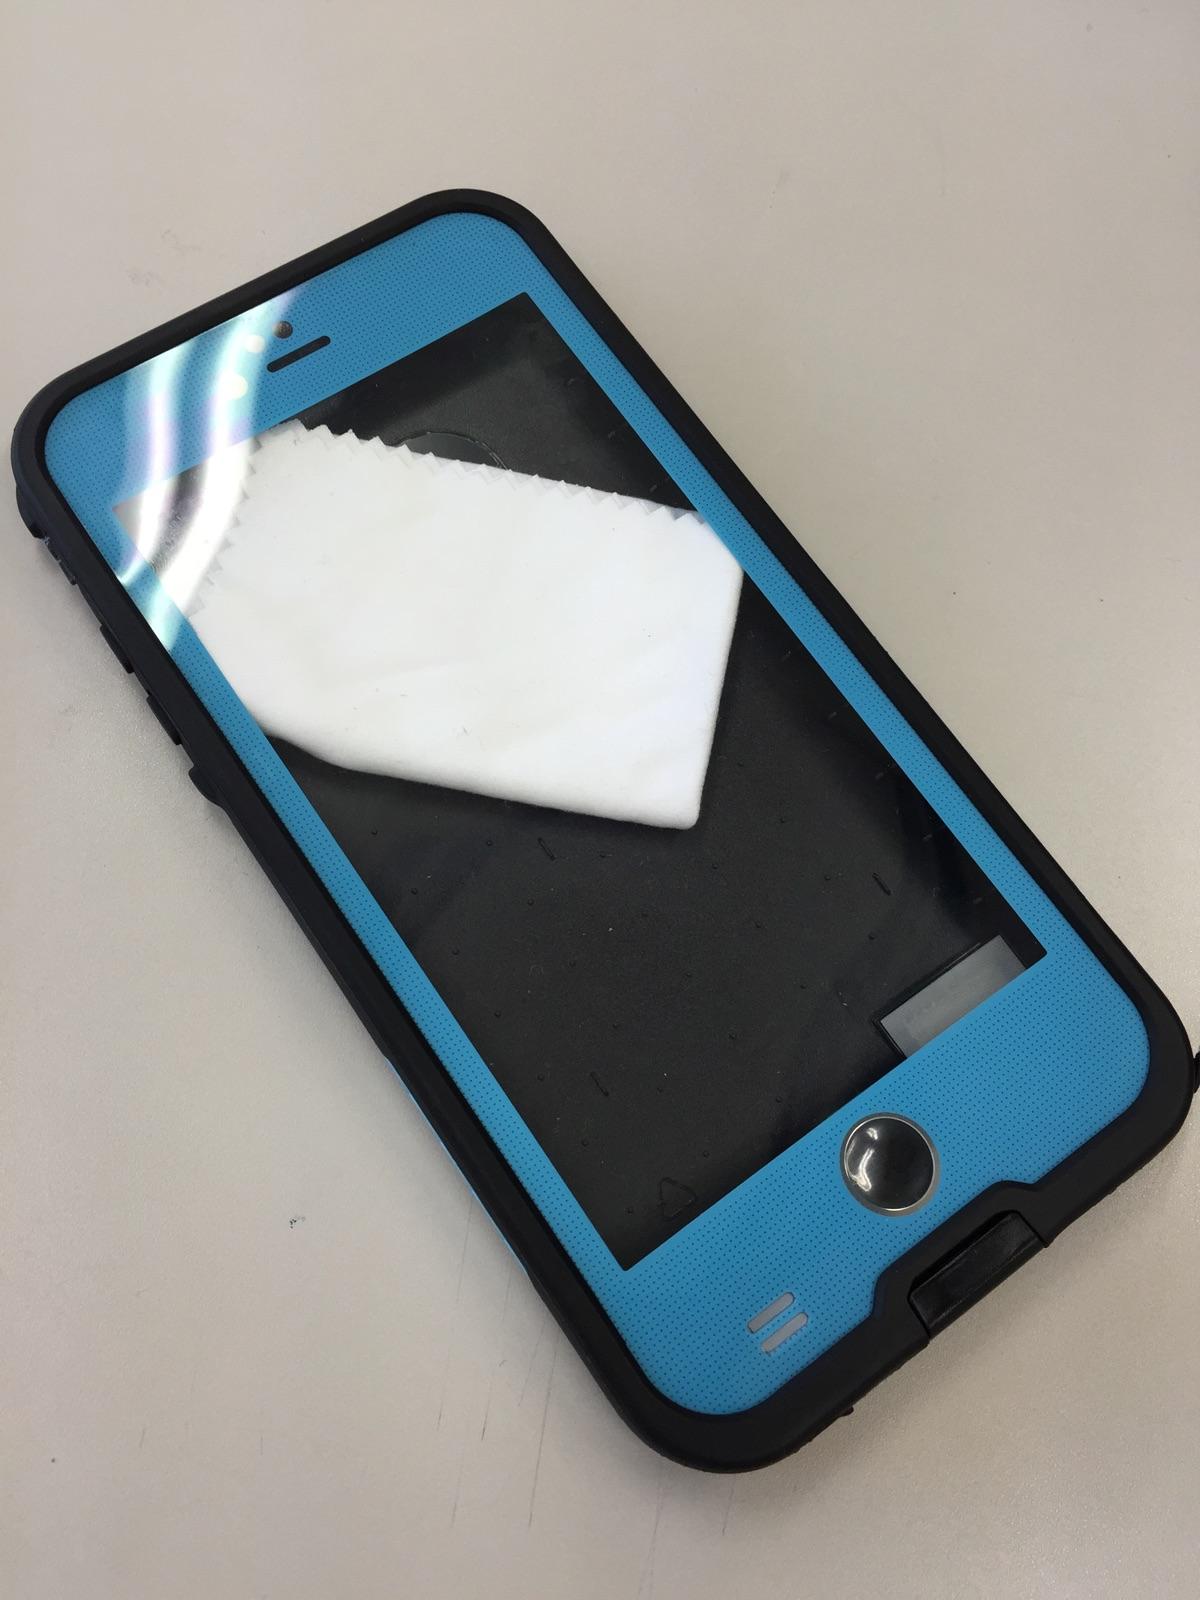 Toughsty iPhone6 plus 防水ケース 防塵耐衝撃ケース 防水ジャケット 水深2M防水